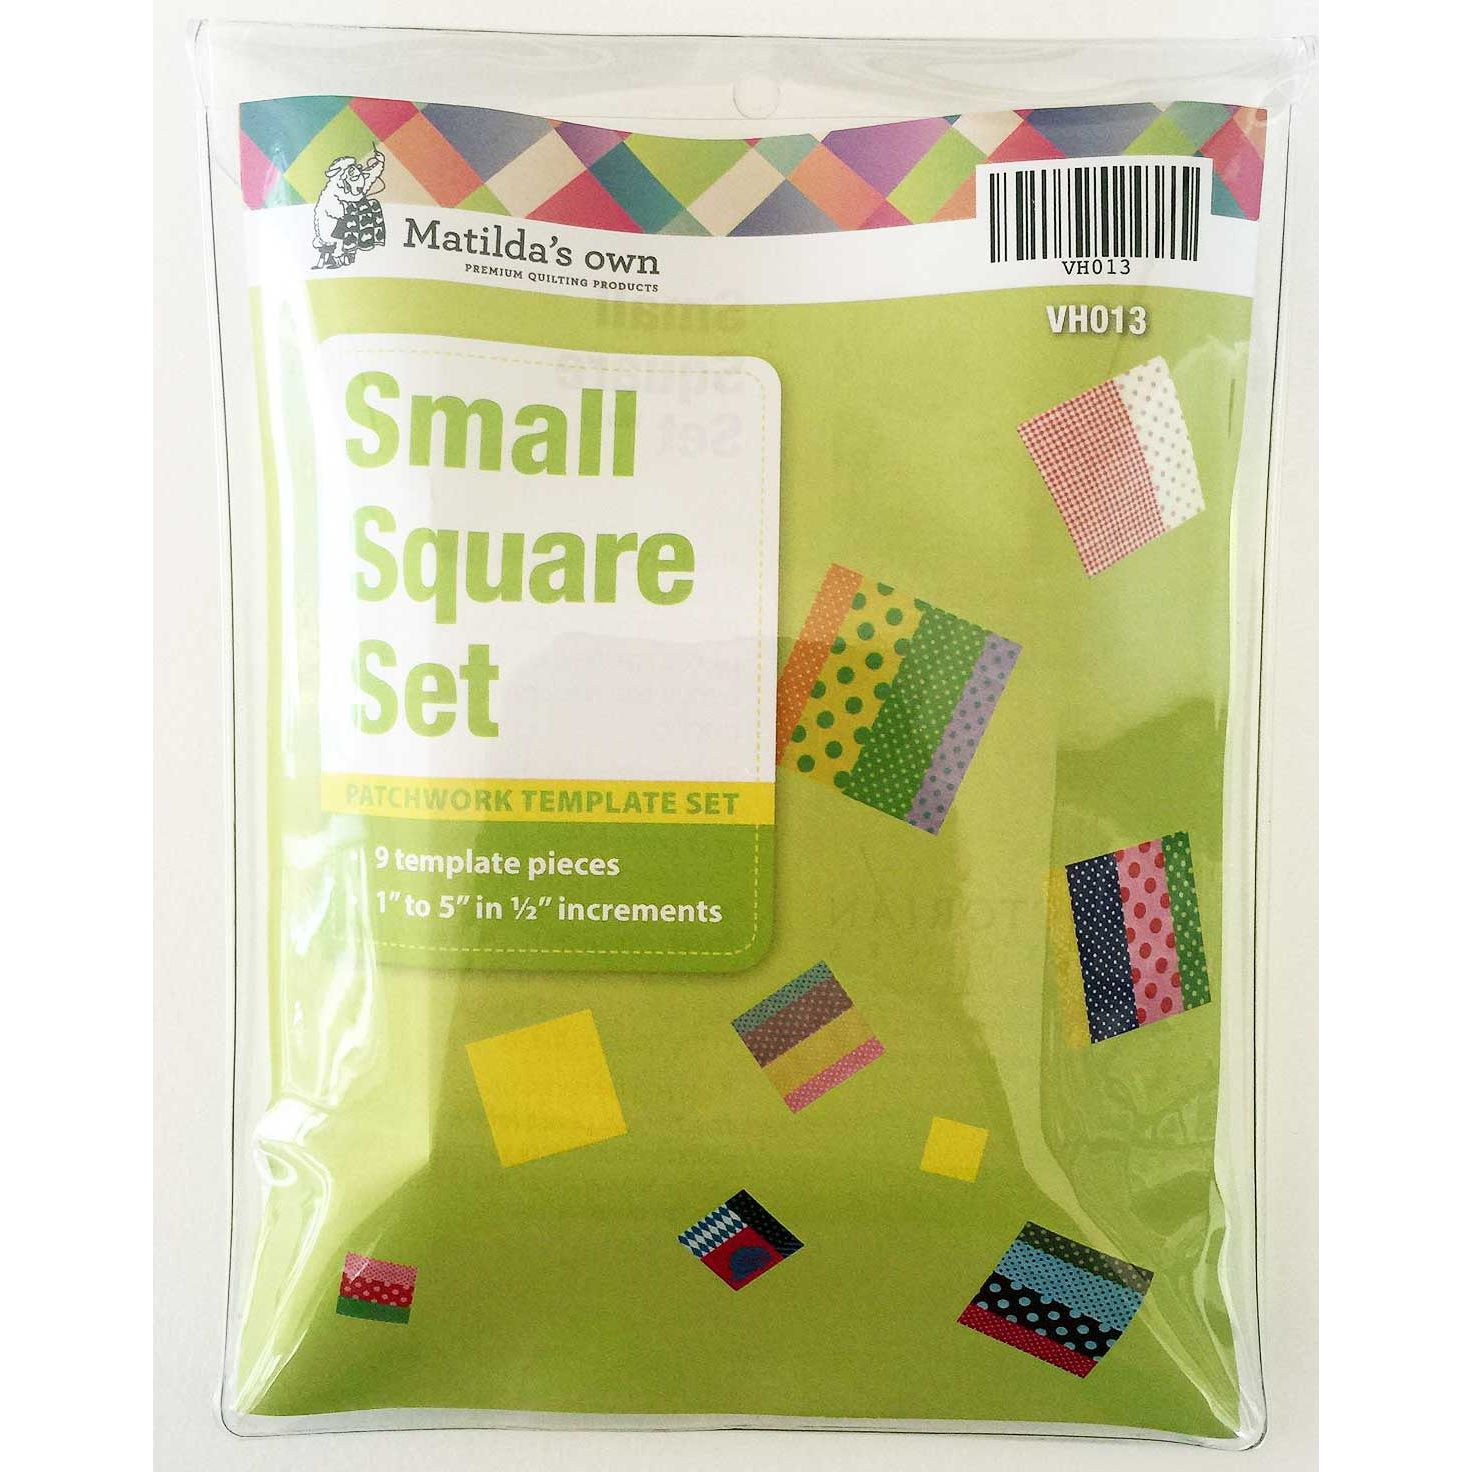 Matildas Own Small Squares Patchwork Template Set By Matildas Own